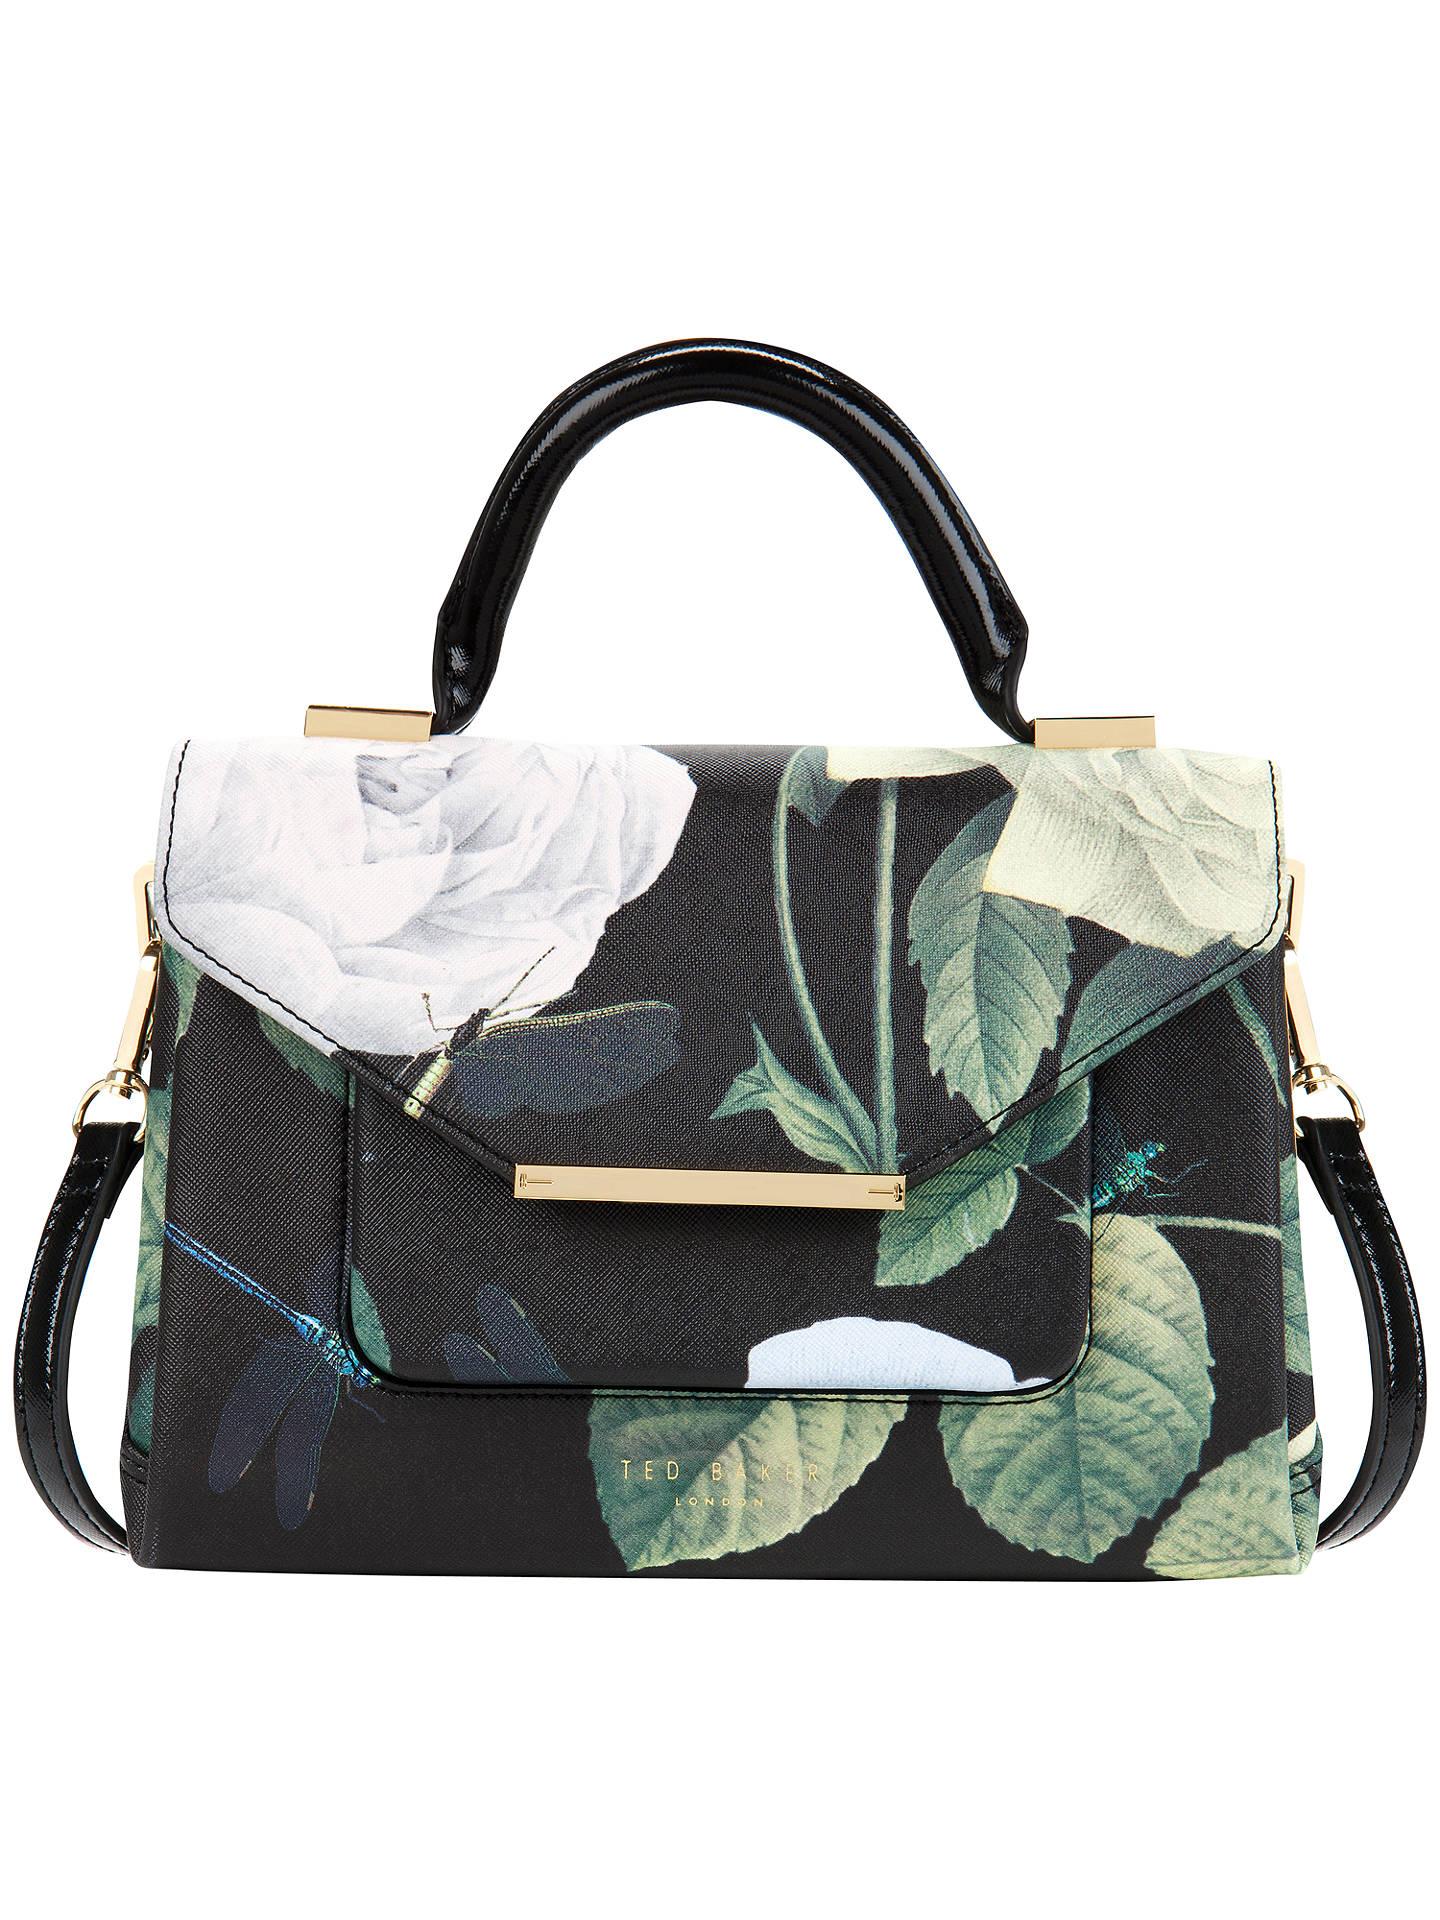 Ted Baker Domina Crosshatch Lady Bag at John Lewis & Partners